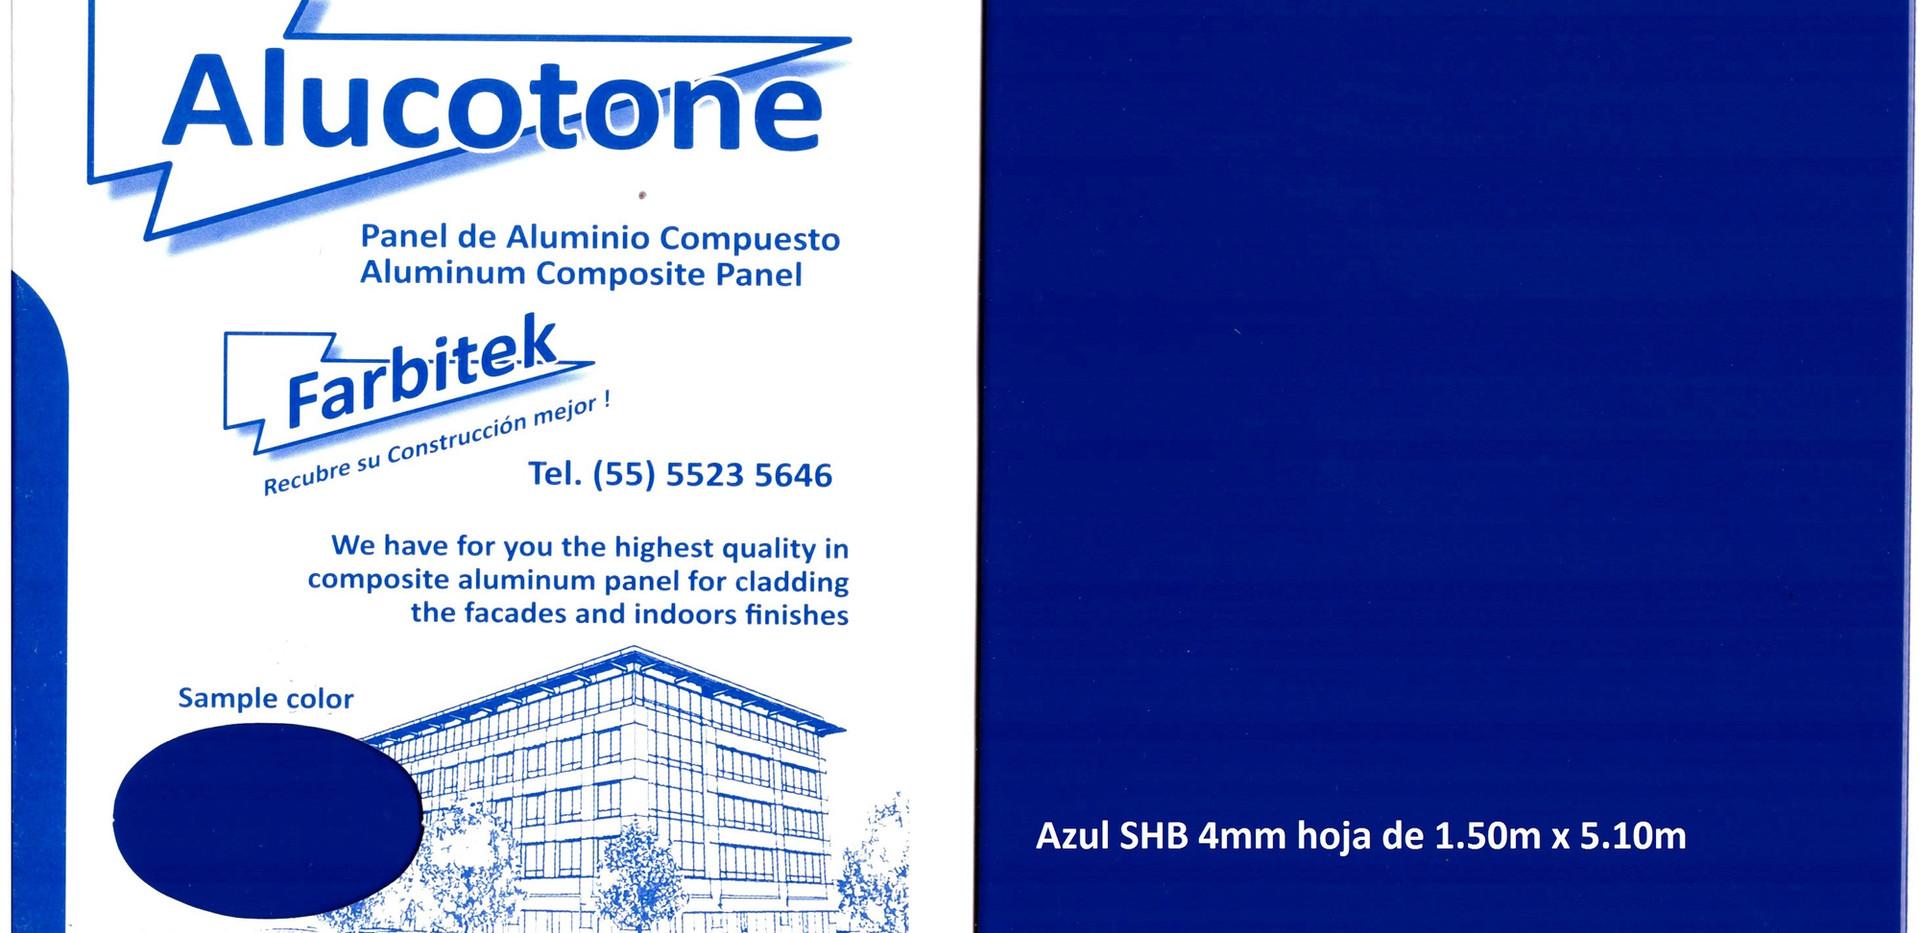 Alucotone%20Azul%20SHB_edited.jpg